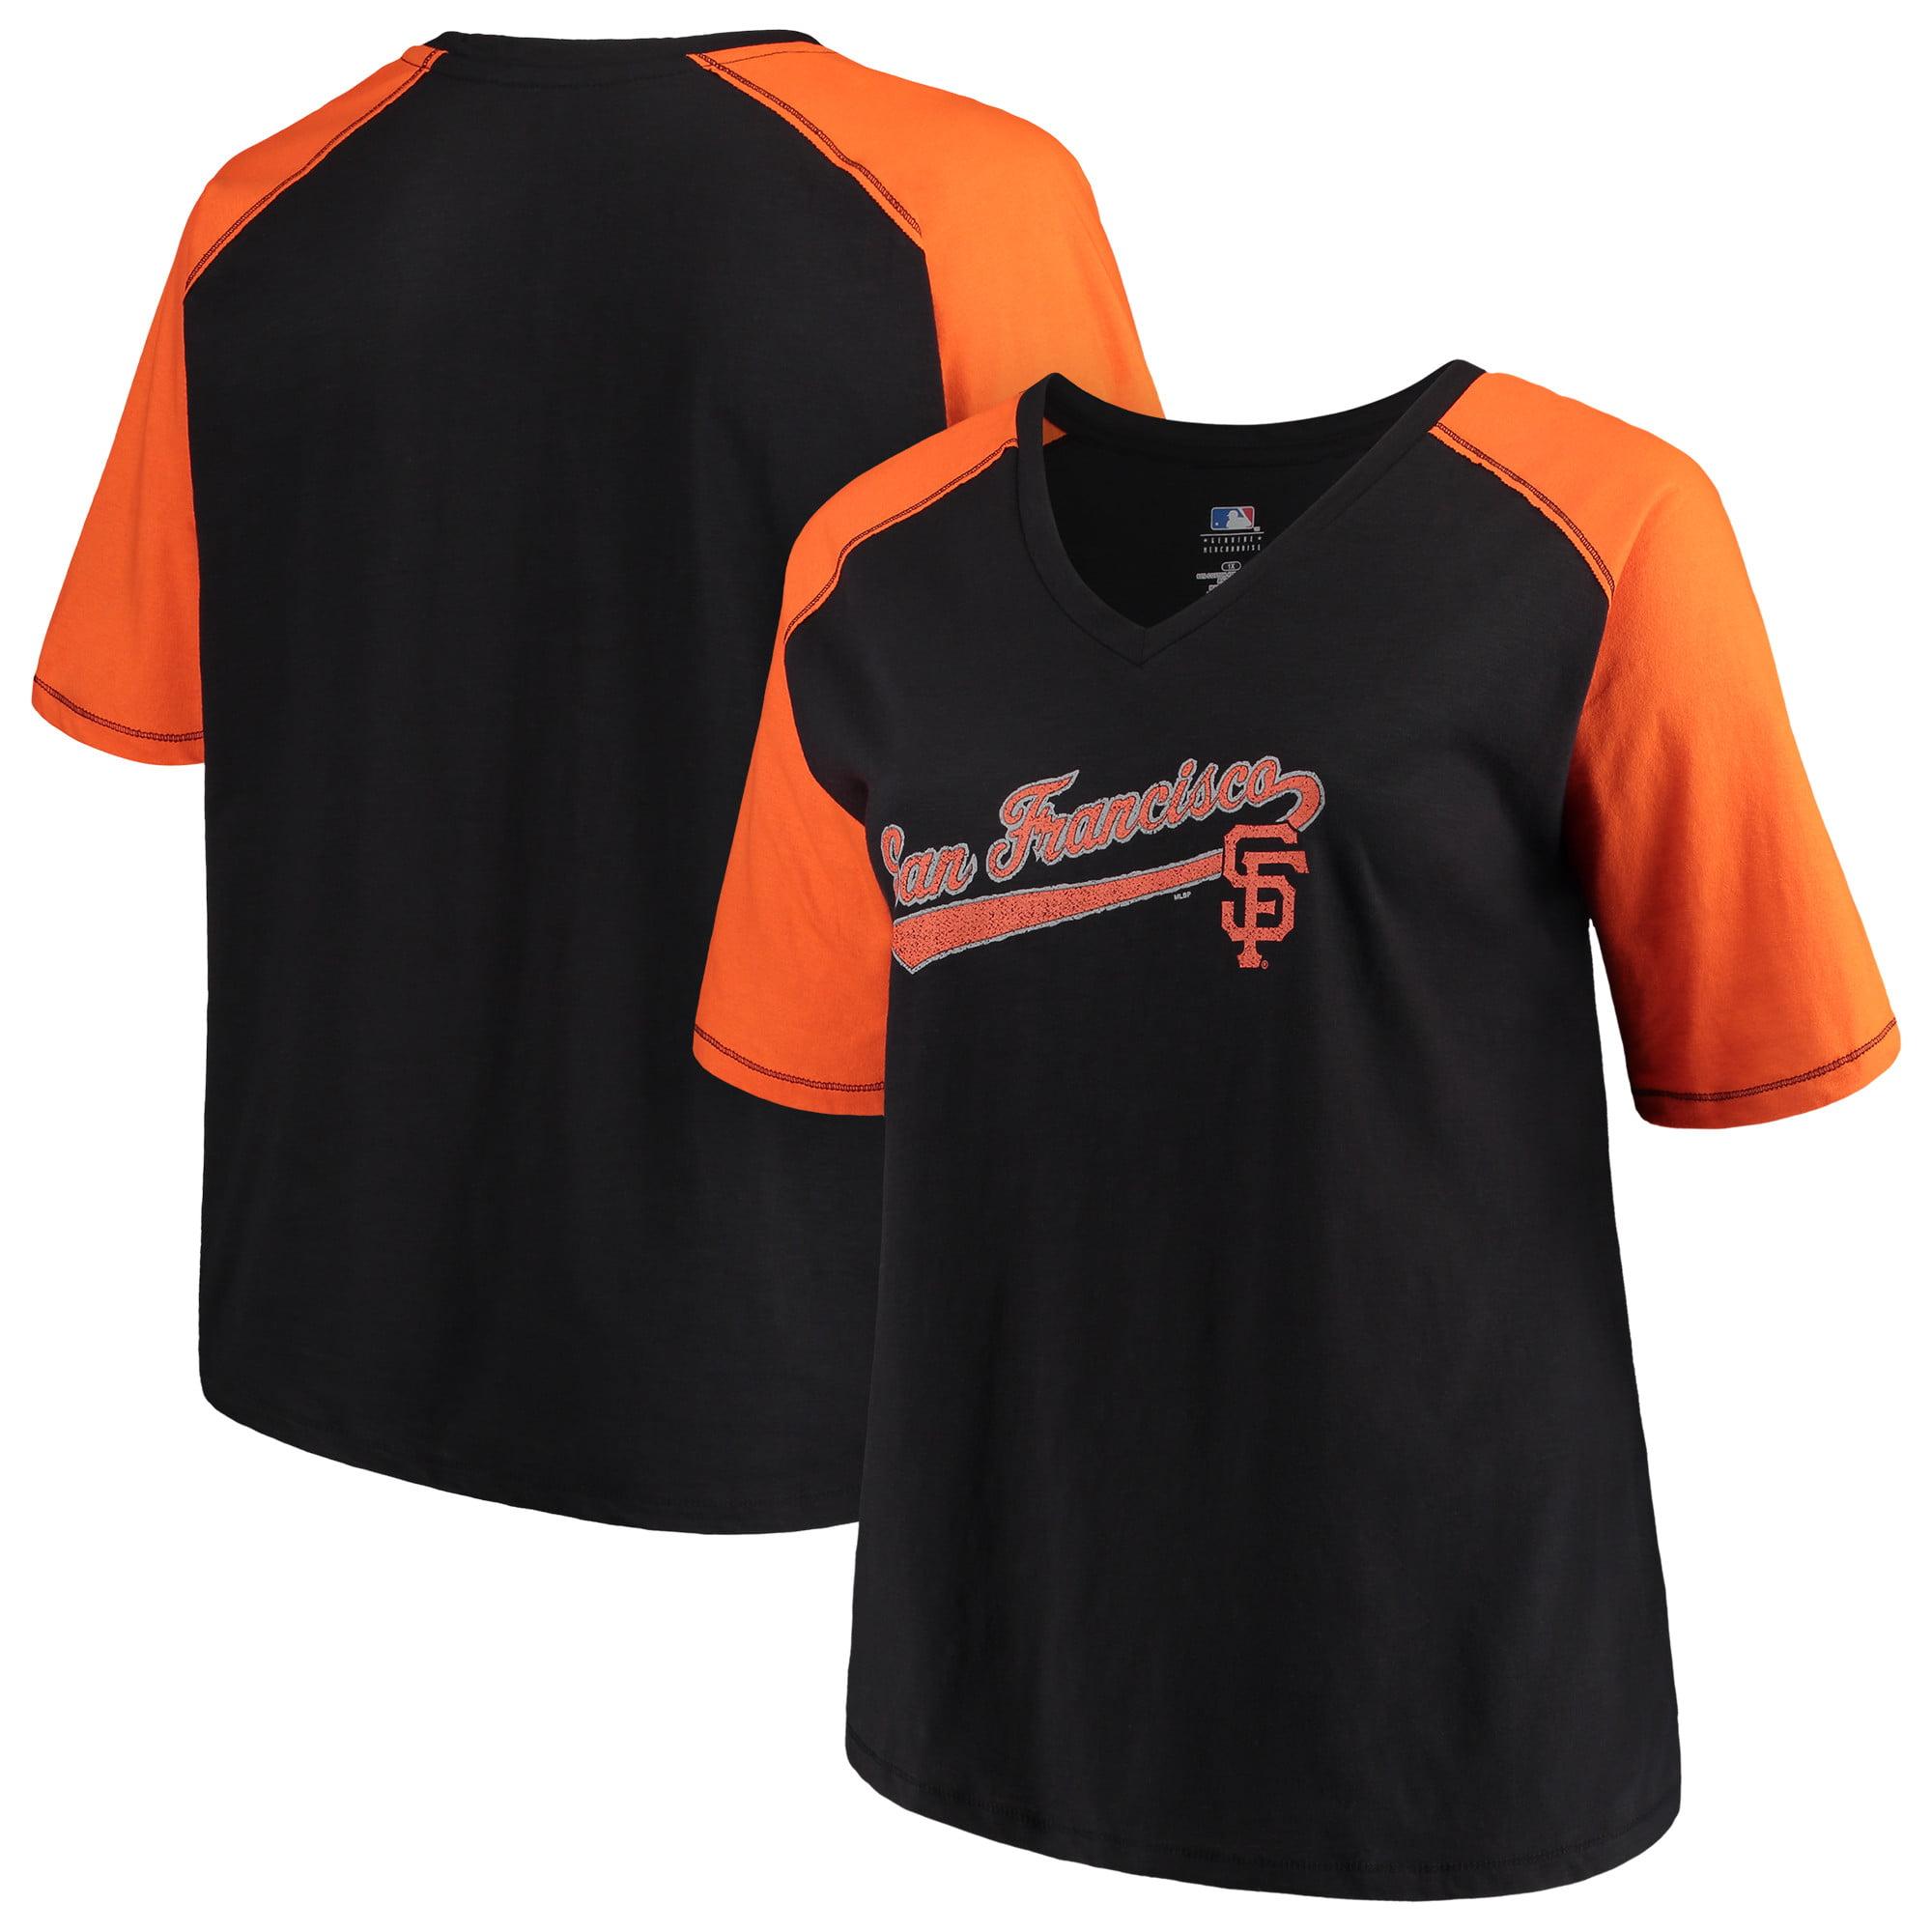 Women's Majestic Black/Orange San Francisco Giants Plus Size High Percentage Raglan V-Neck T-Shirt